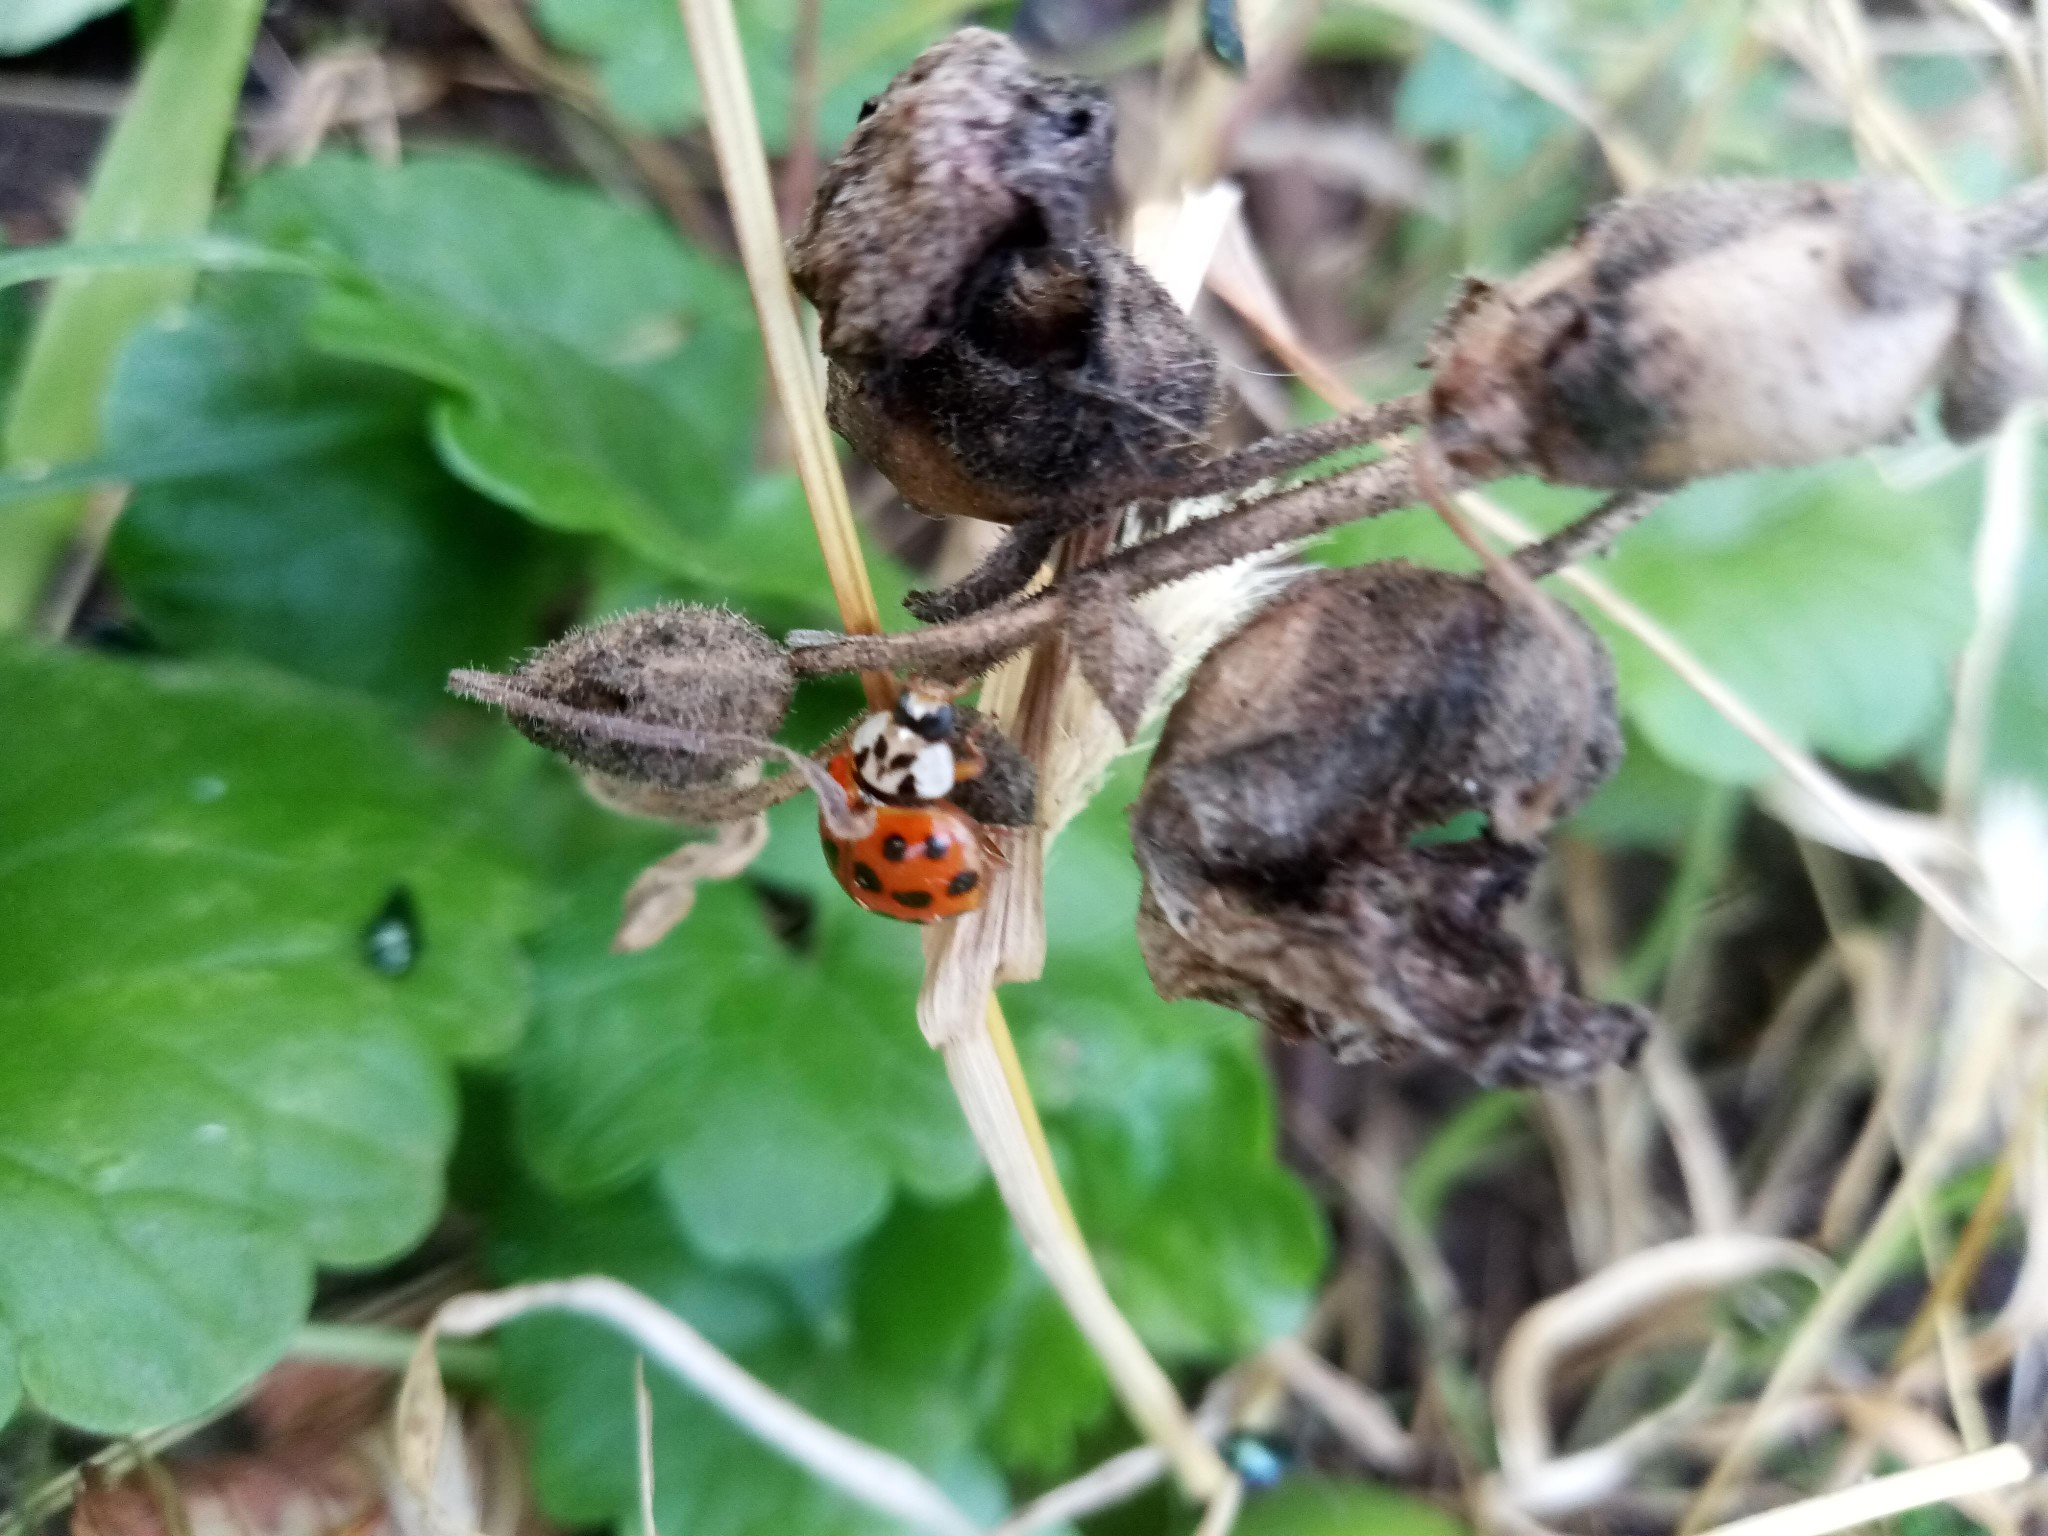 Ladybug on green grass photo